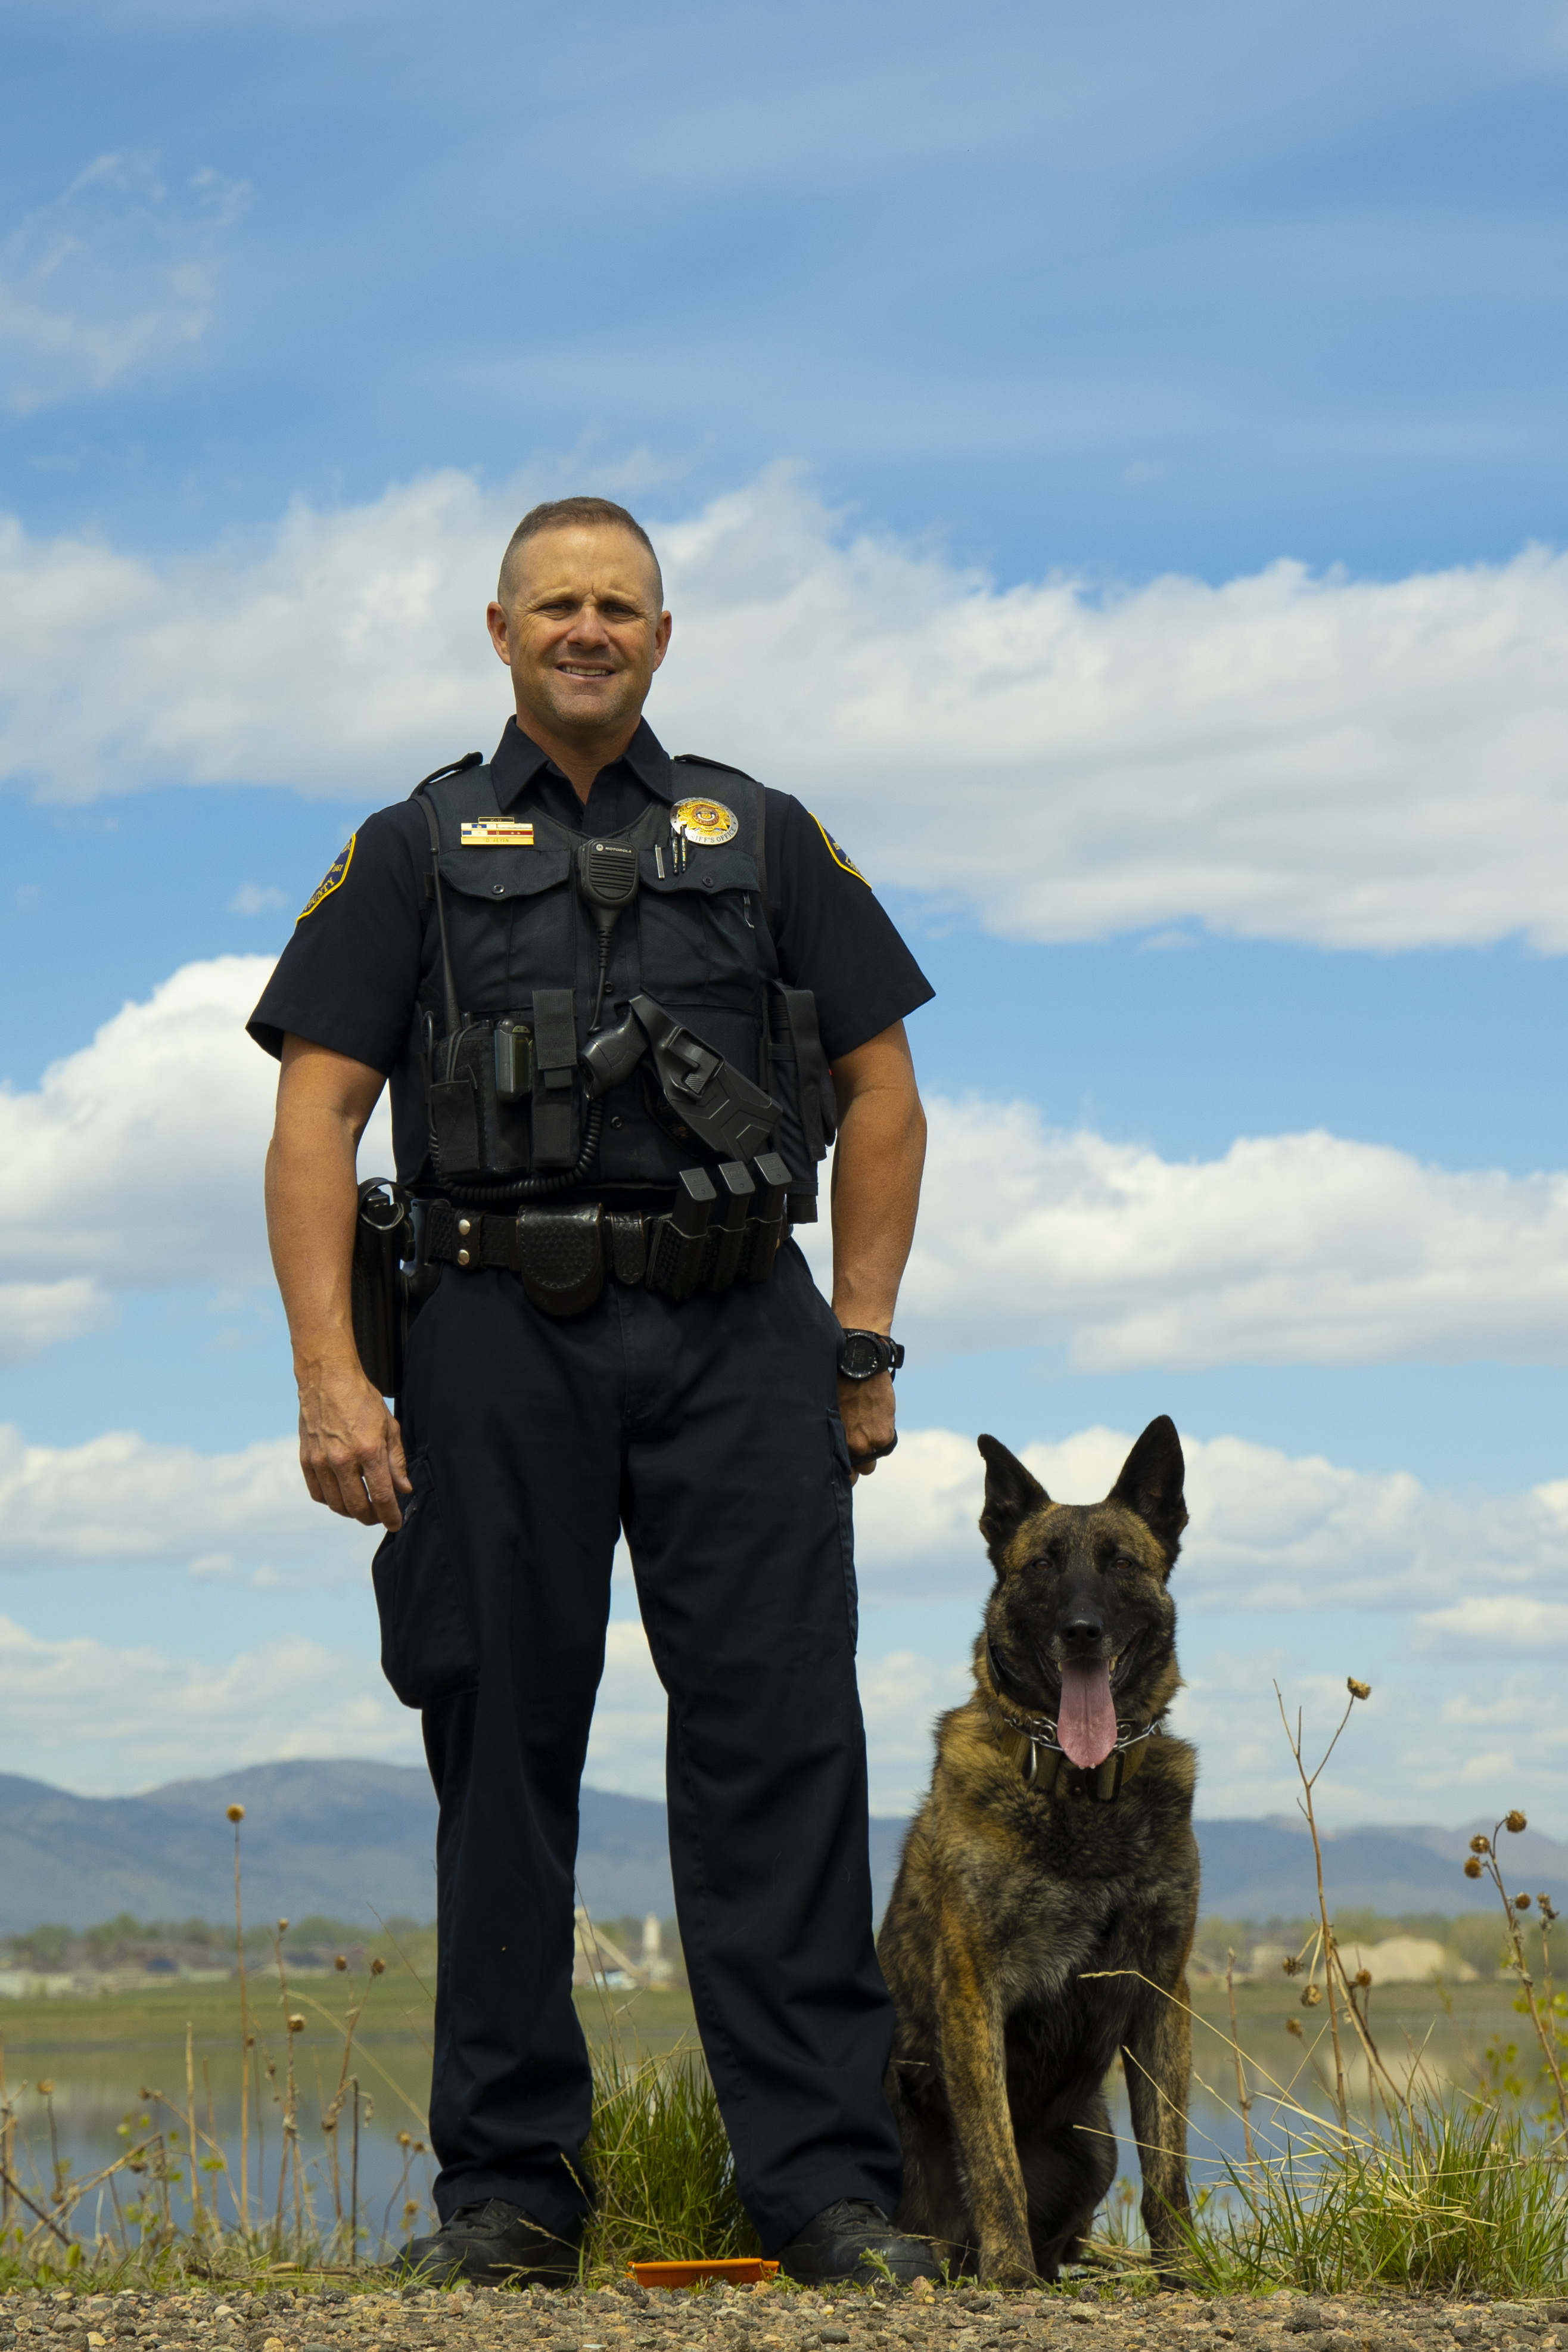 Image 2: Deputy Dave Feyen and K9 Dox (Dutch Shepherd)